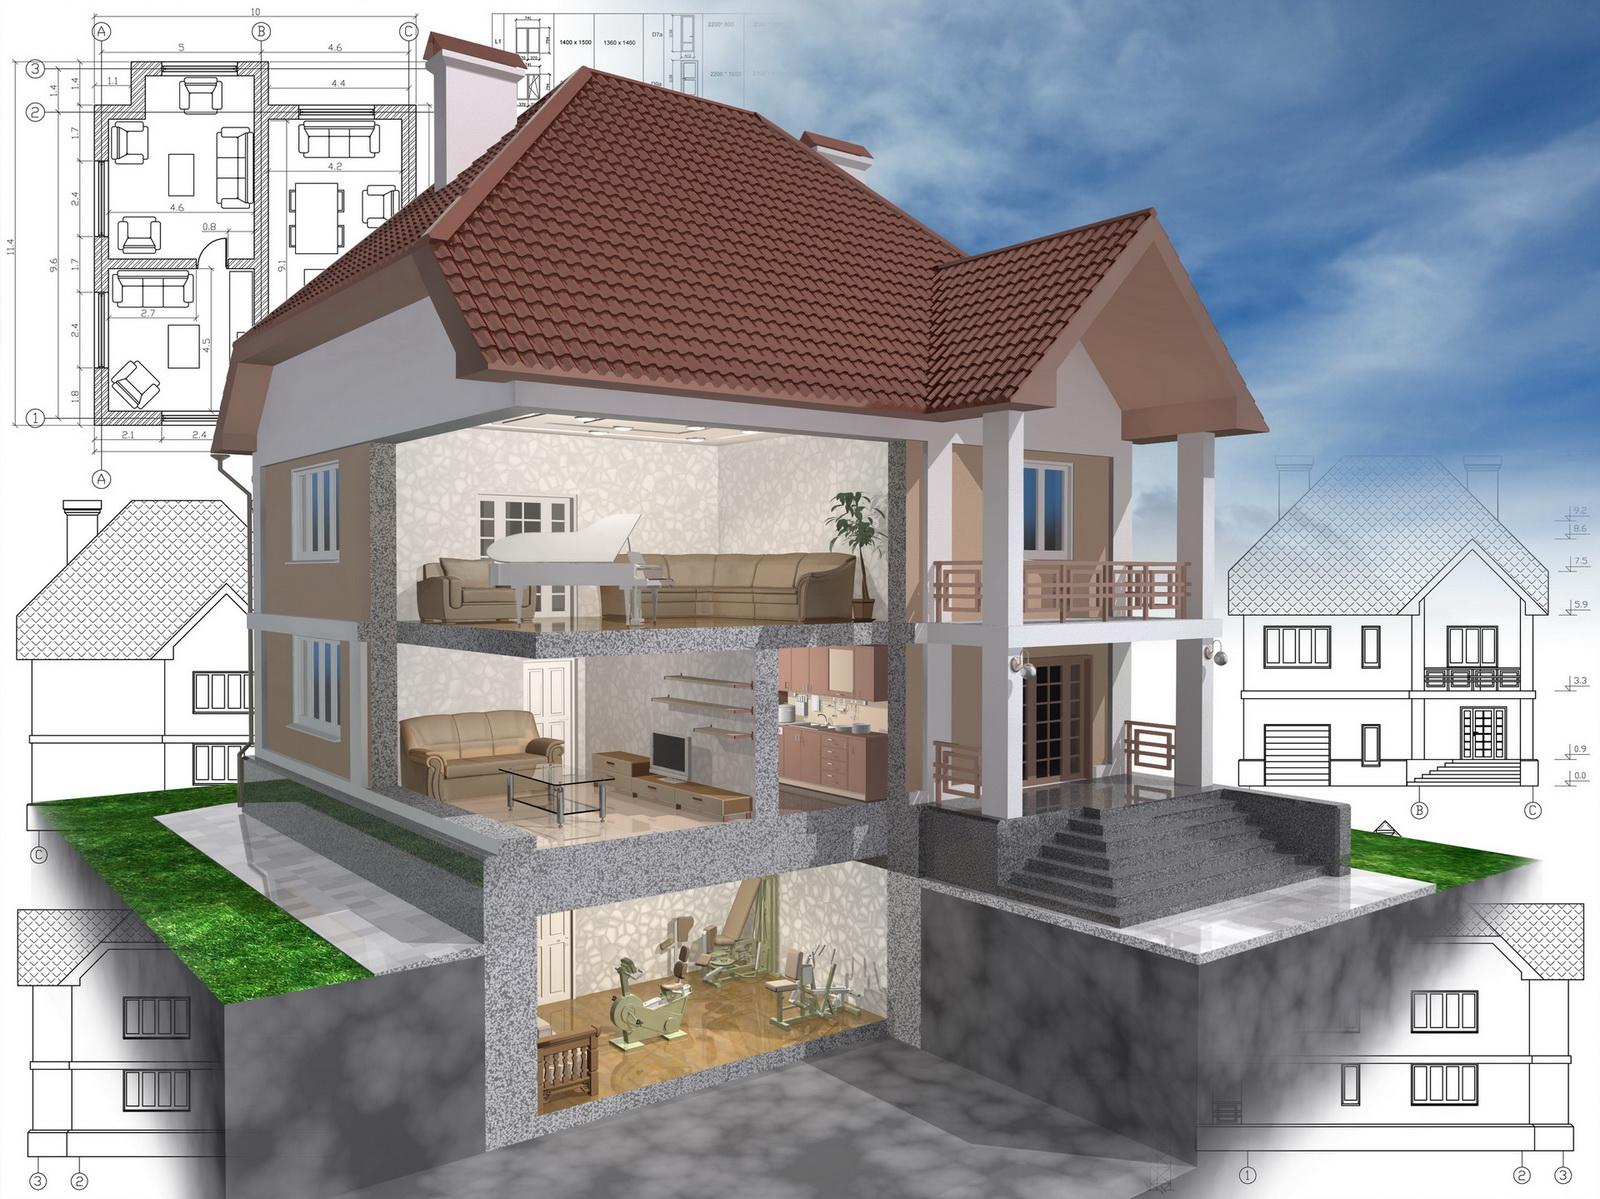 1403920793_architecture128_uaweb.info_